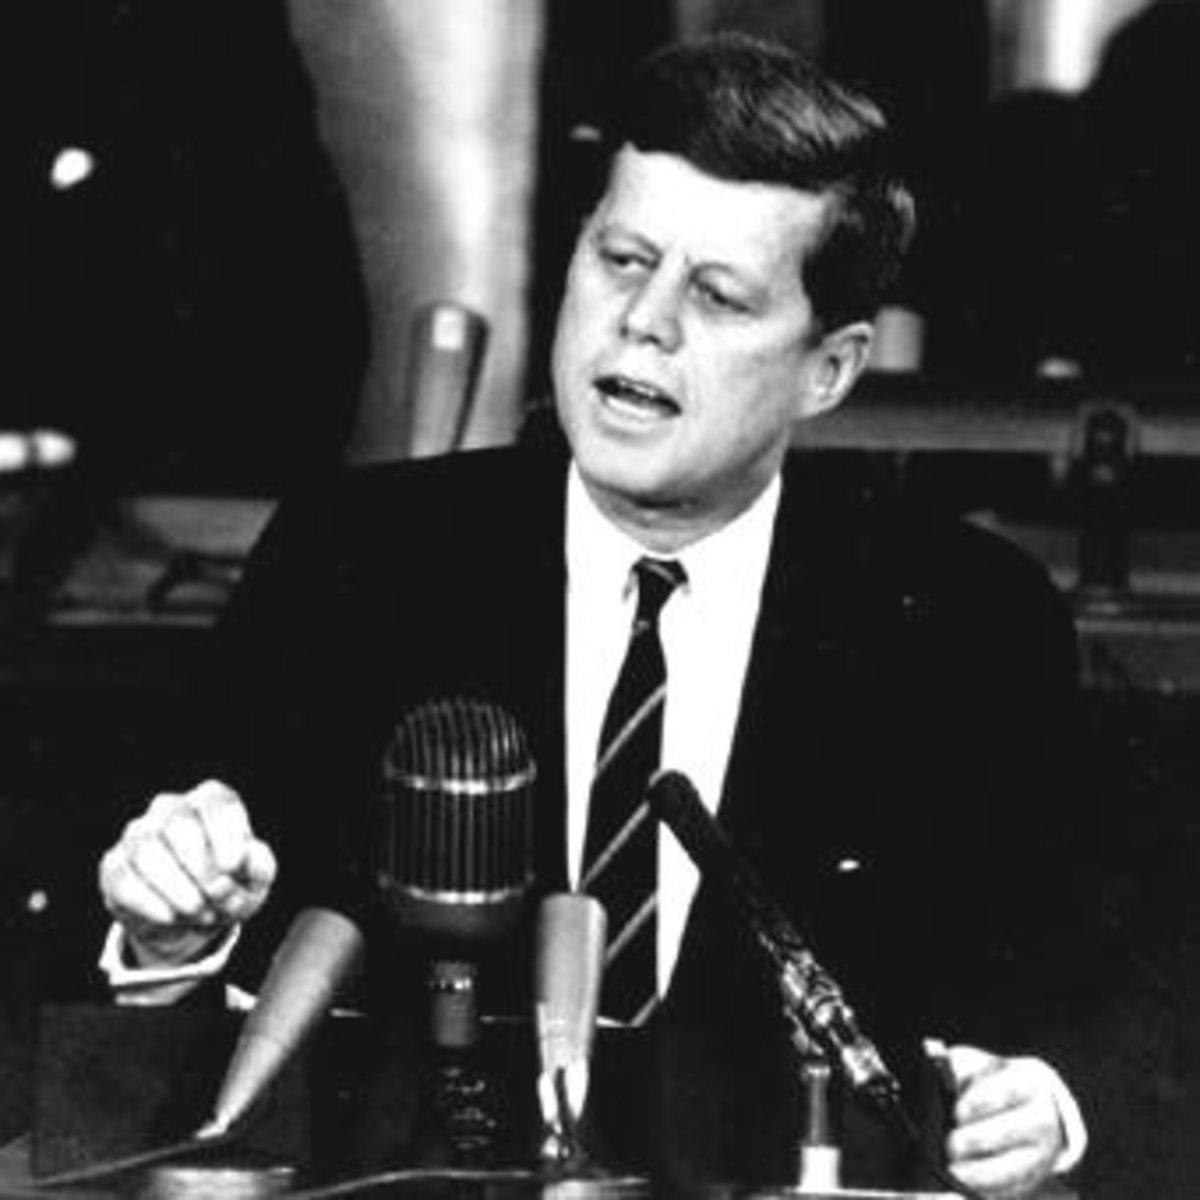 Memorable speech